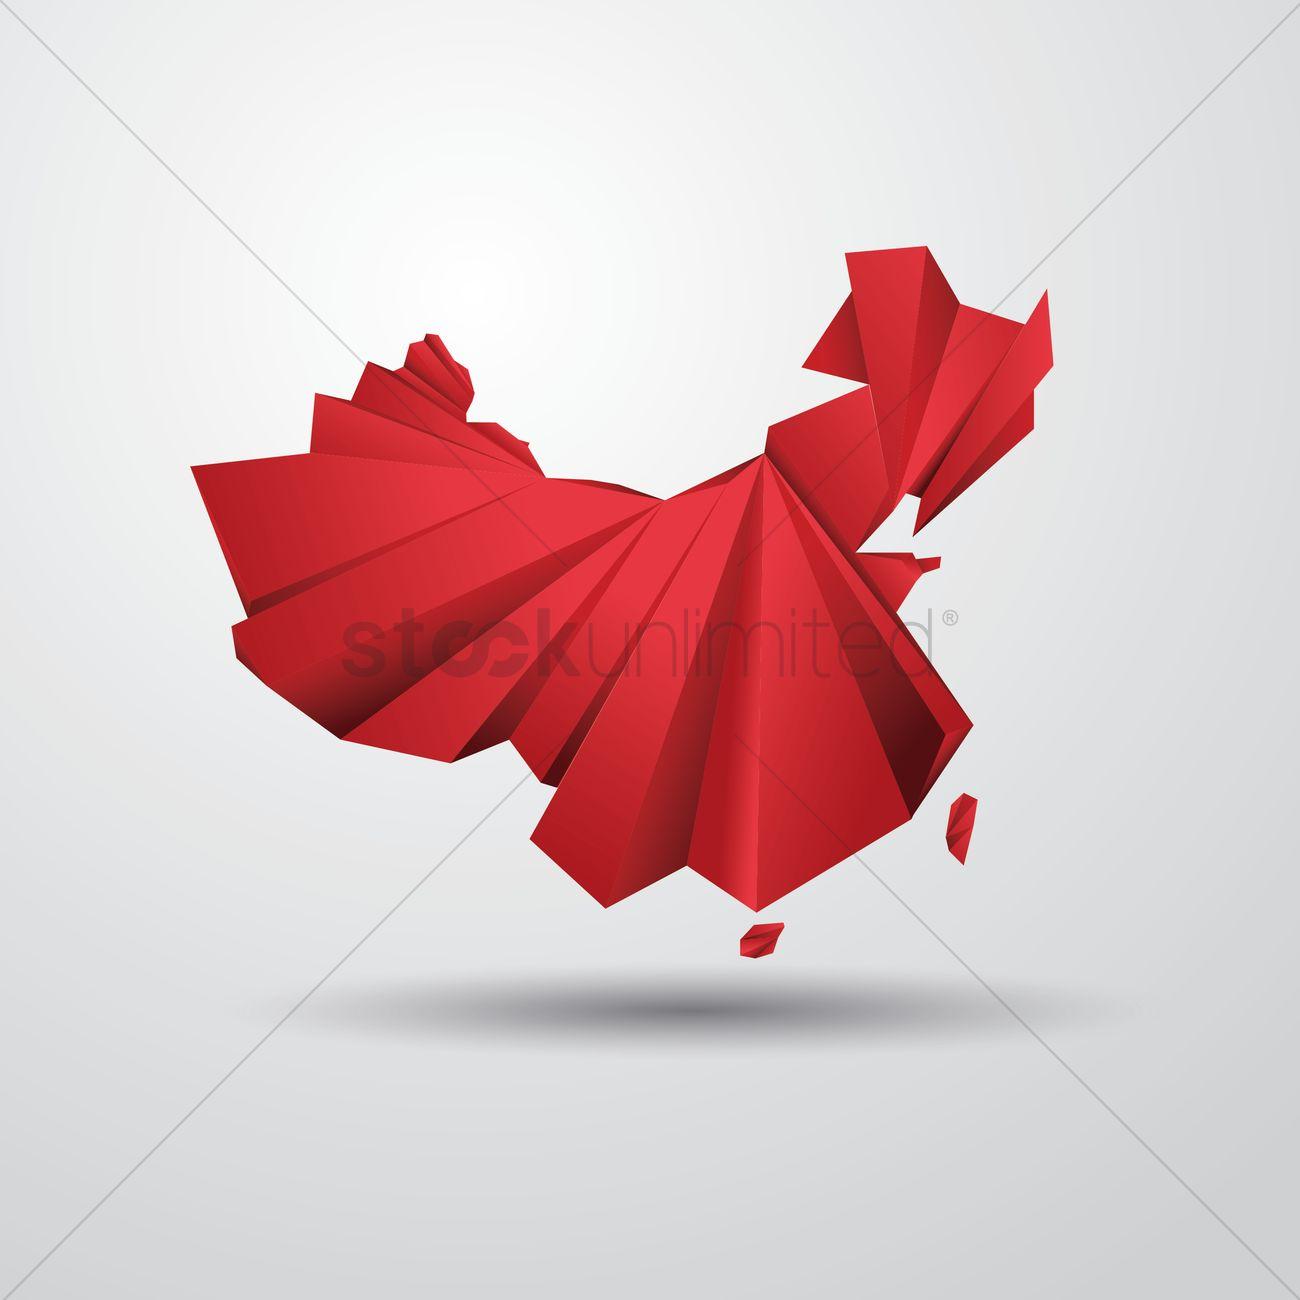 China Map Vector Image 1594449 Stockunlimited